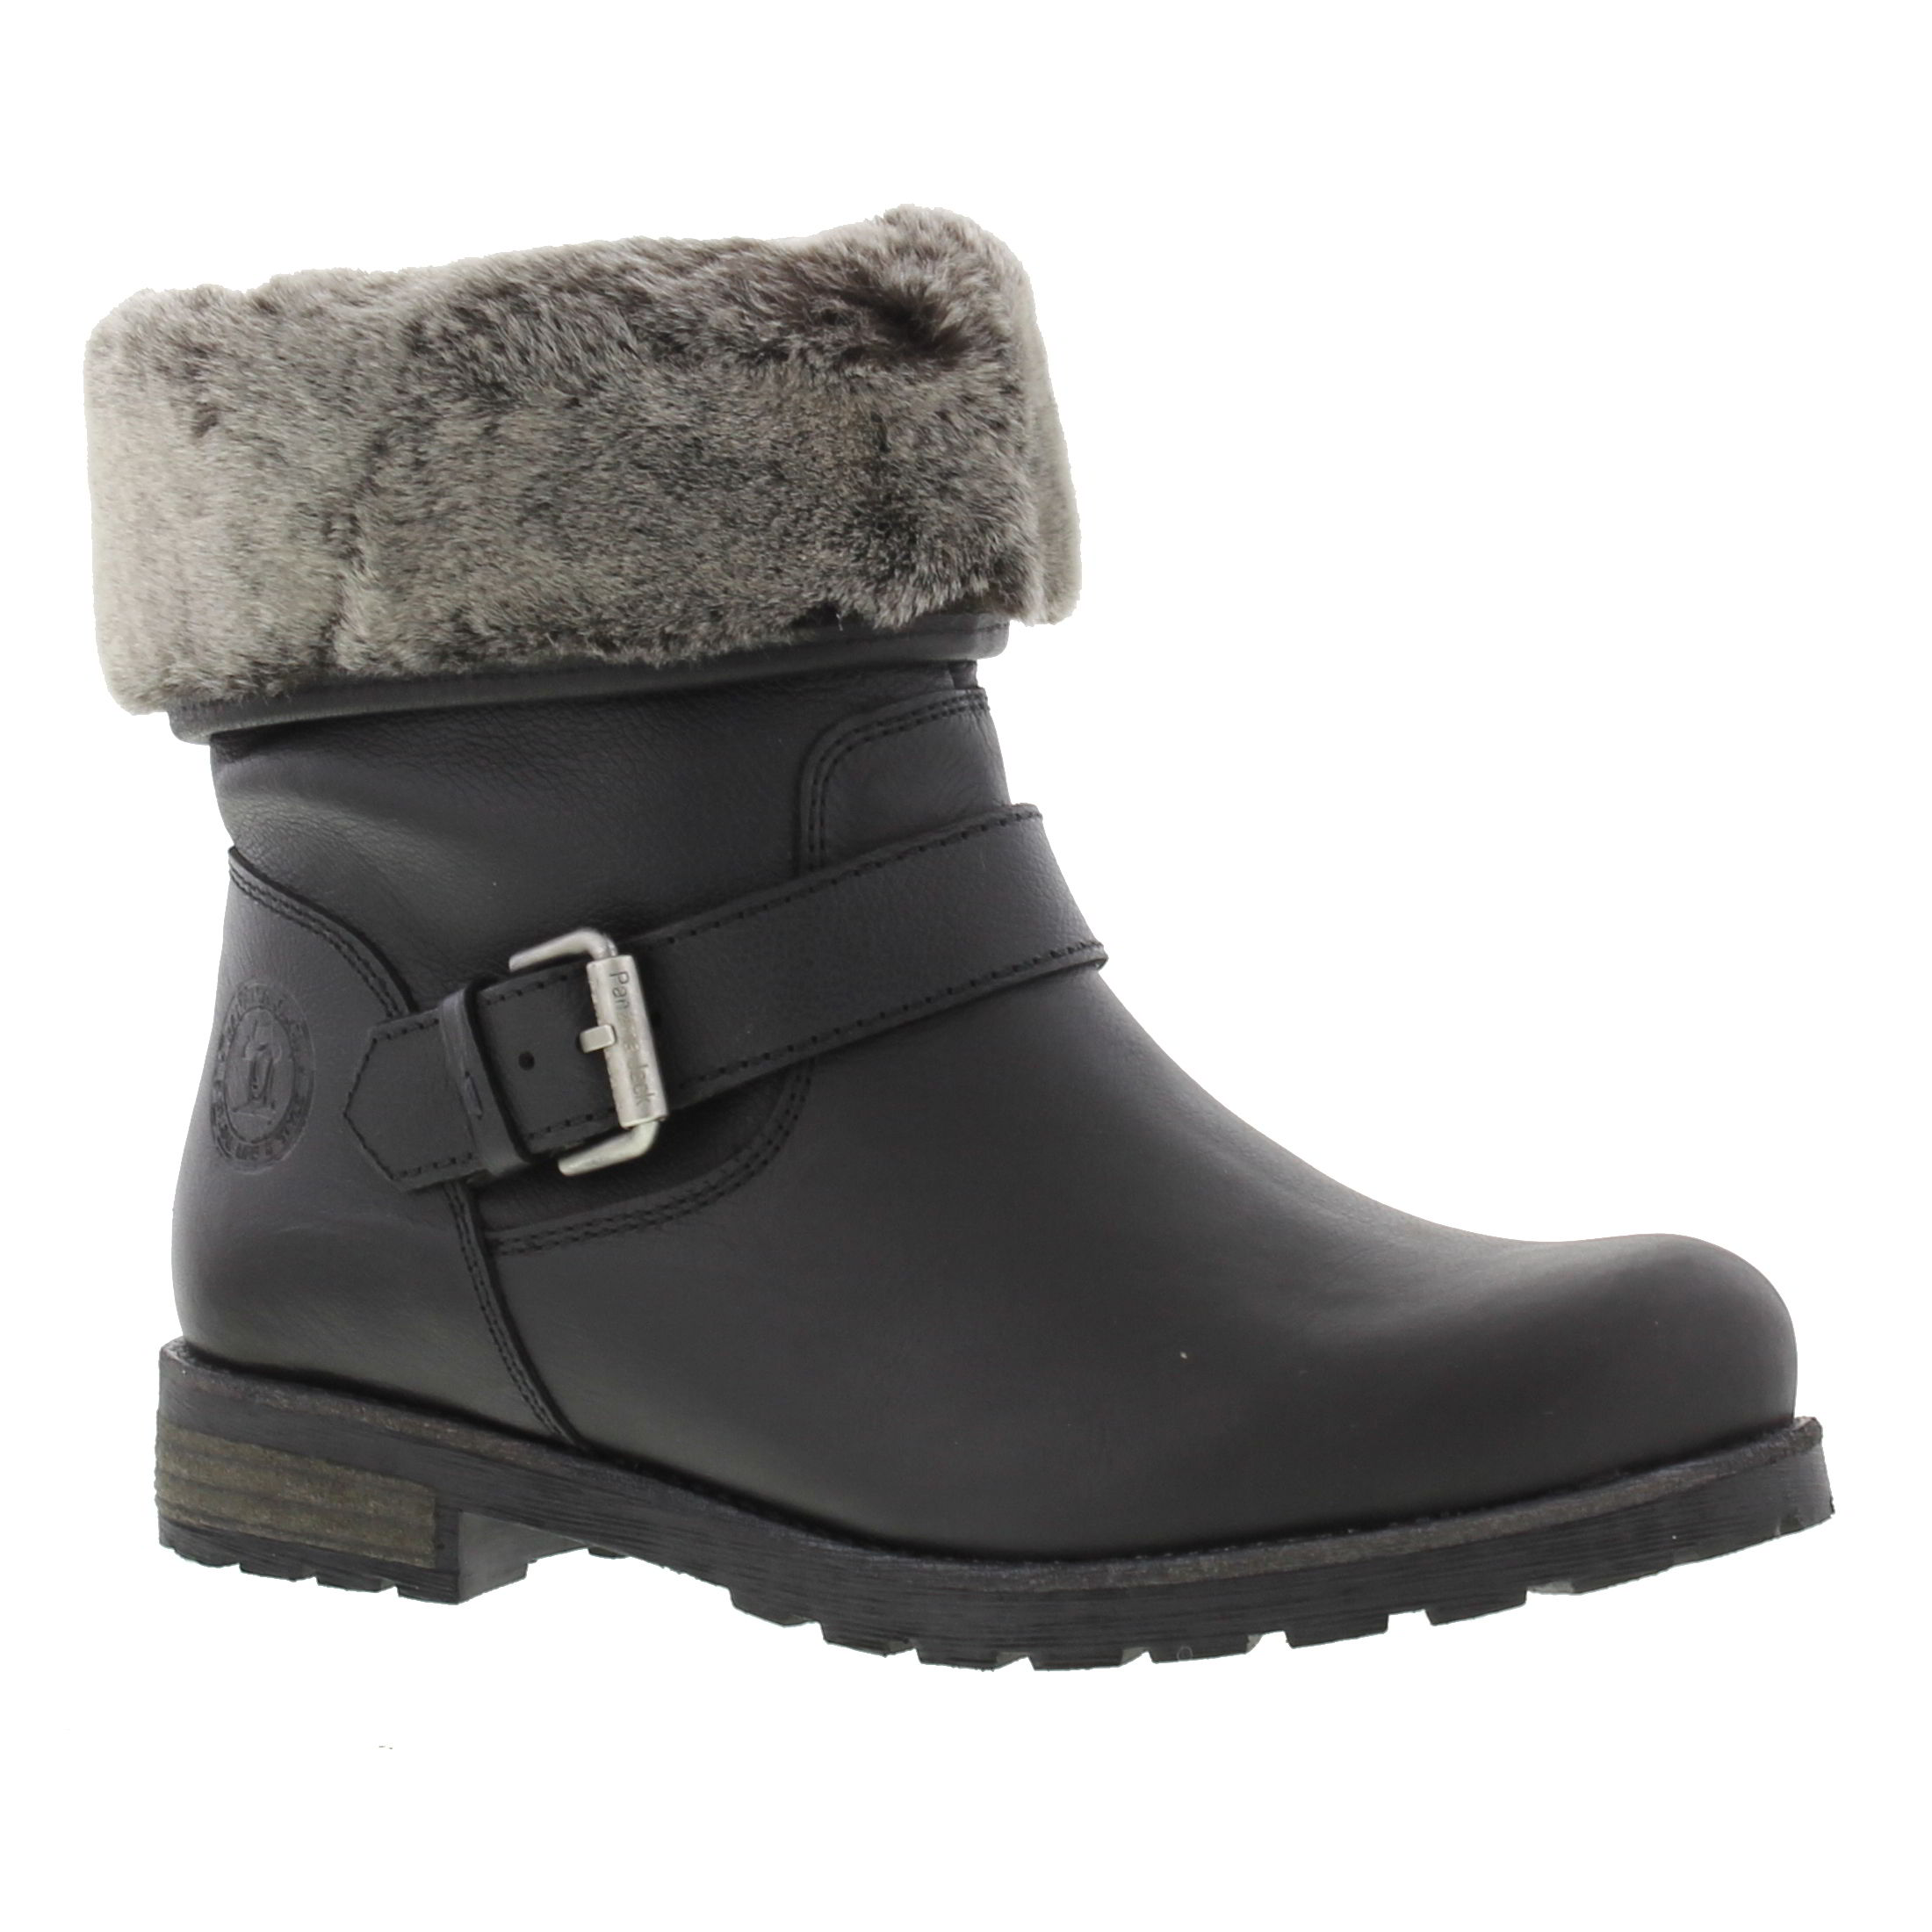 Luxury Women39s Boots Panama 03 Bark  PANAMA JACK Official Store